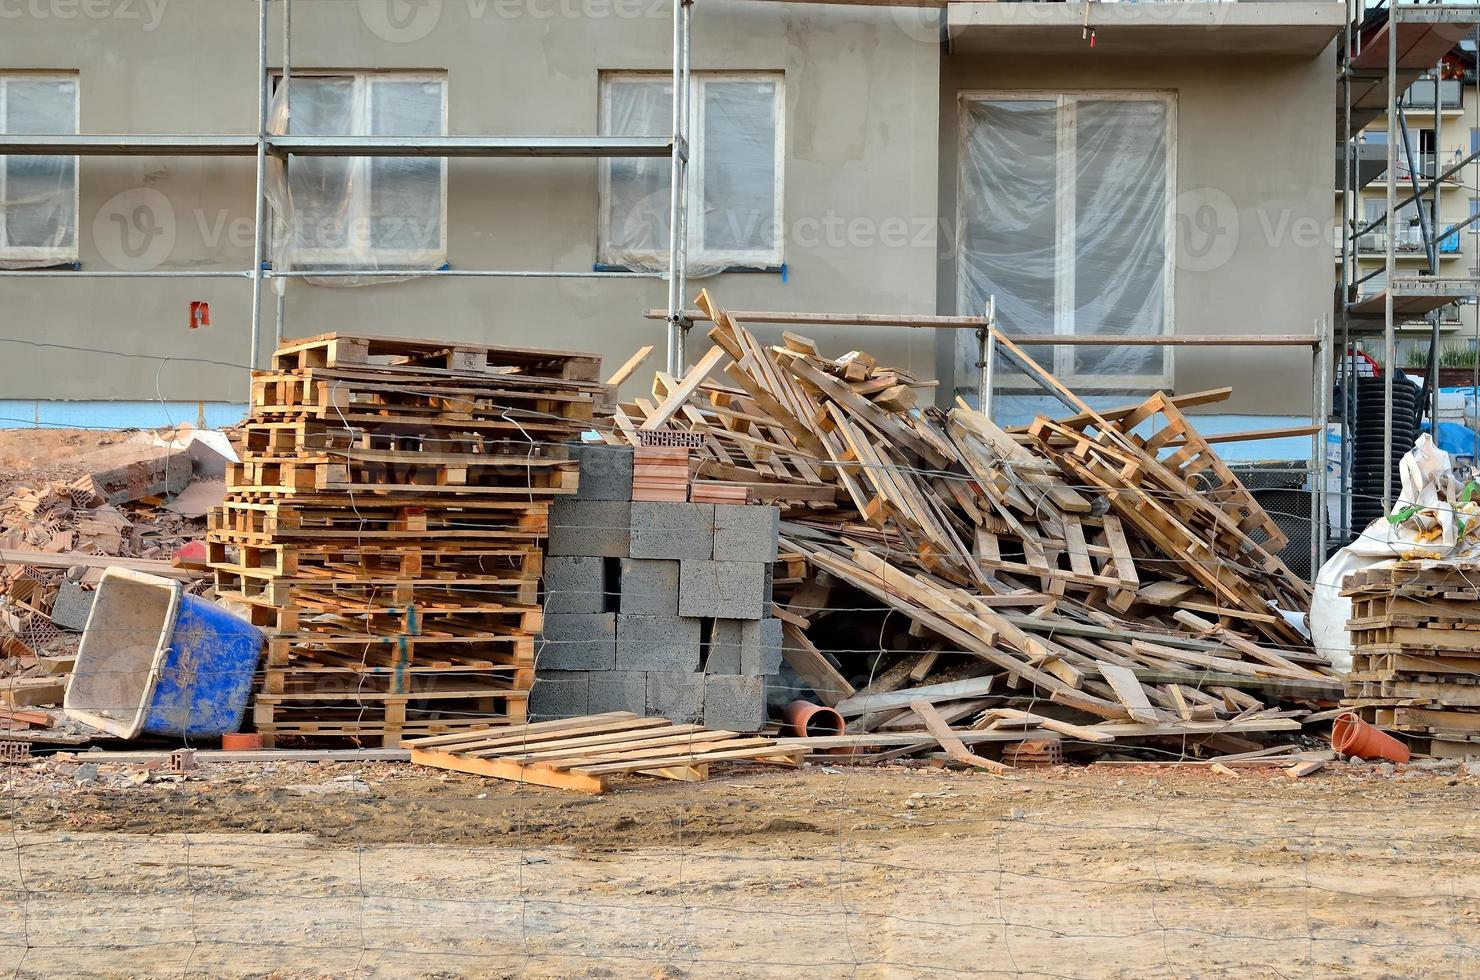 Wohnblock im Bau. foto